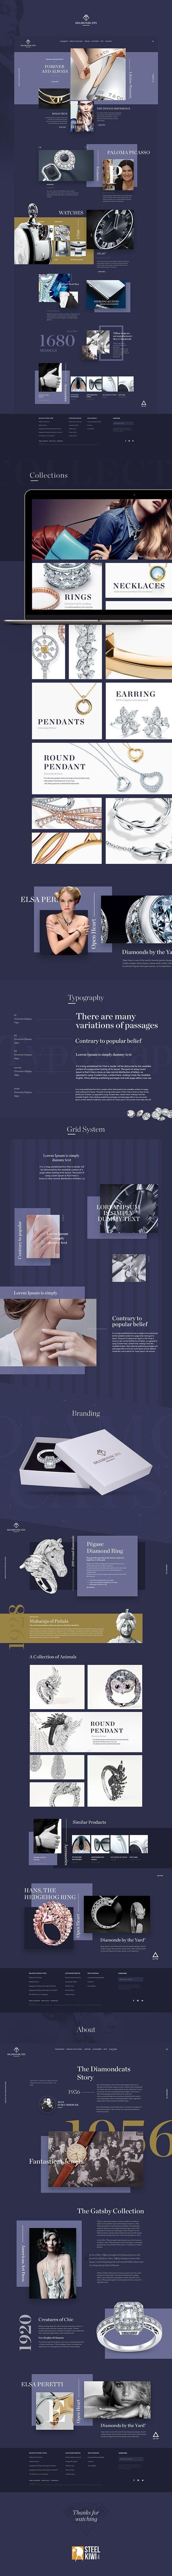 Diamondcats Web Design | Fivestar Branding – Design and Branding Agency & Inspiration Gallery